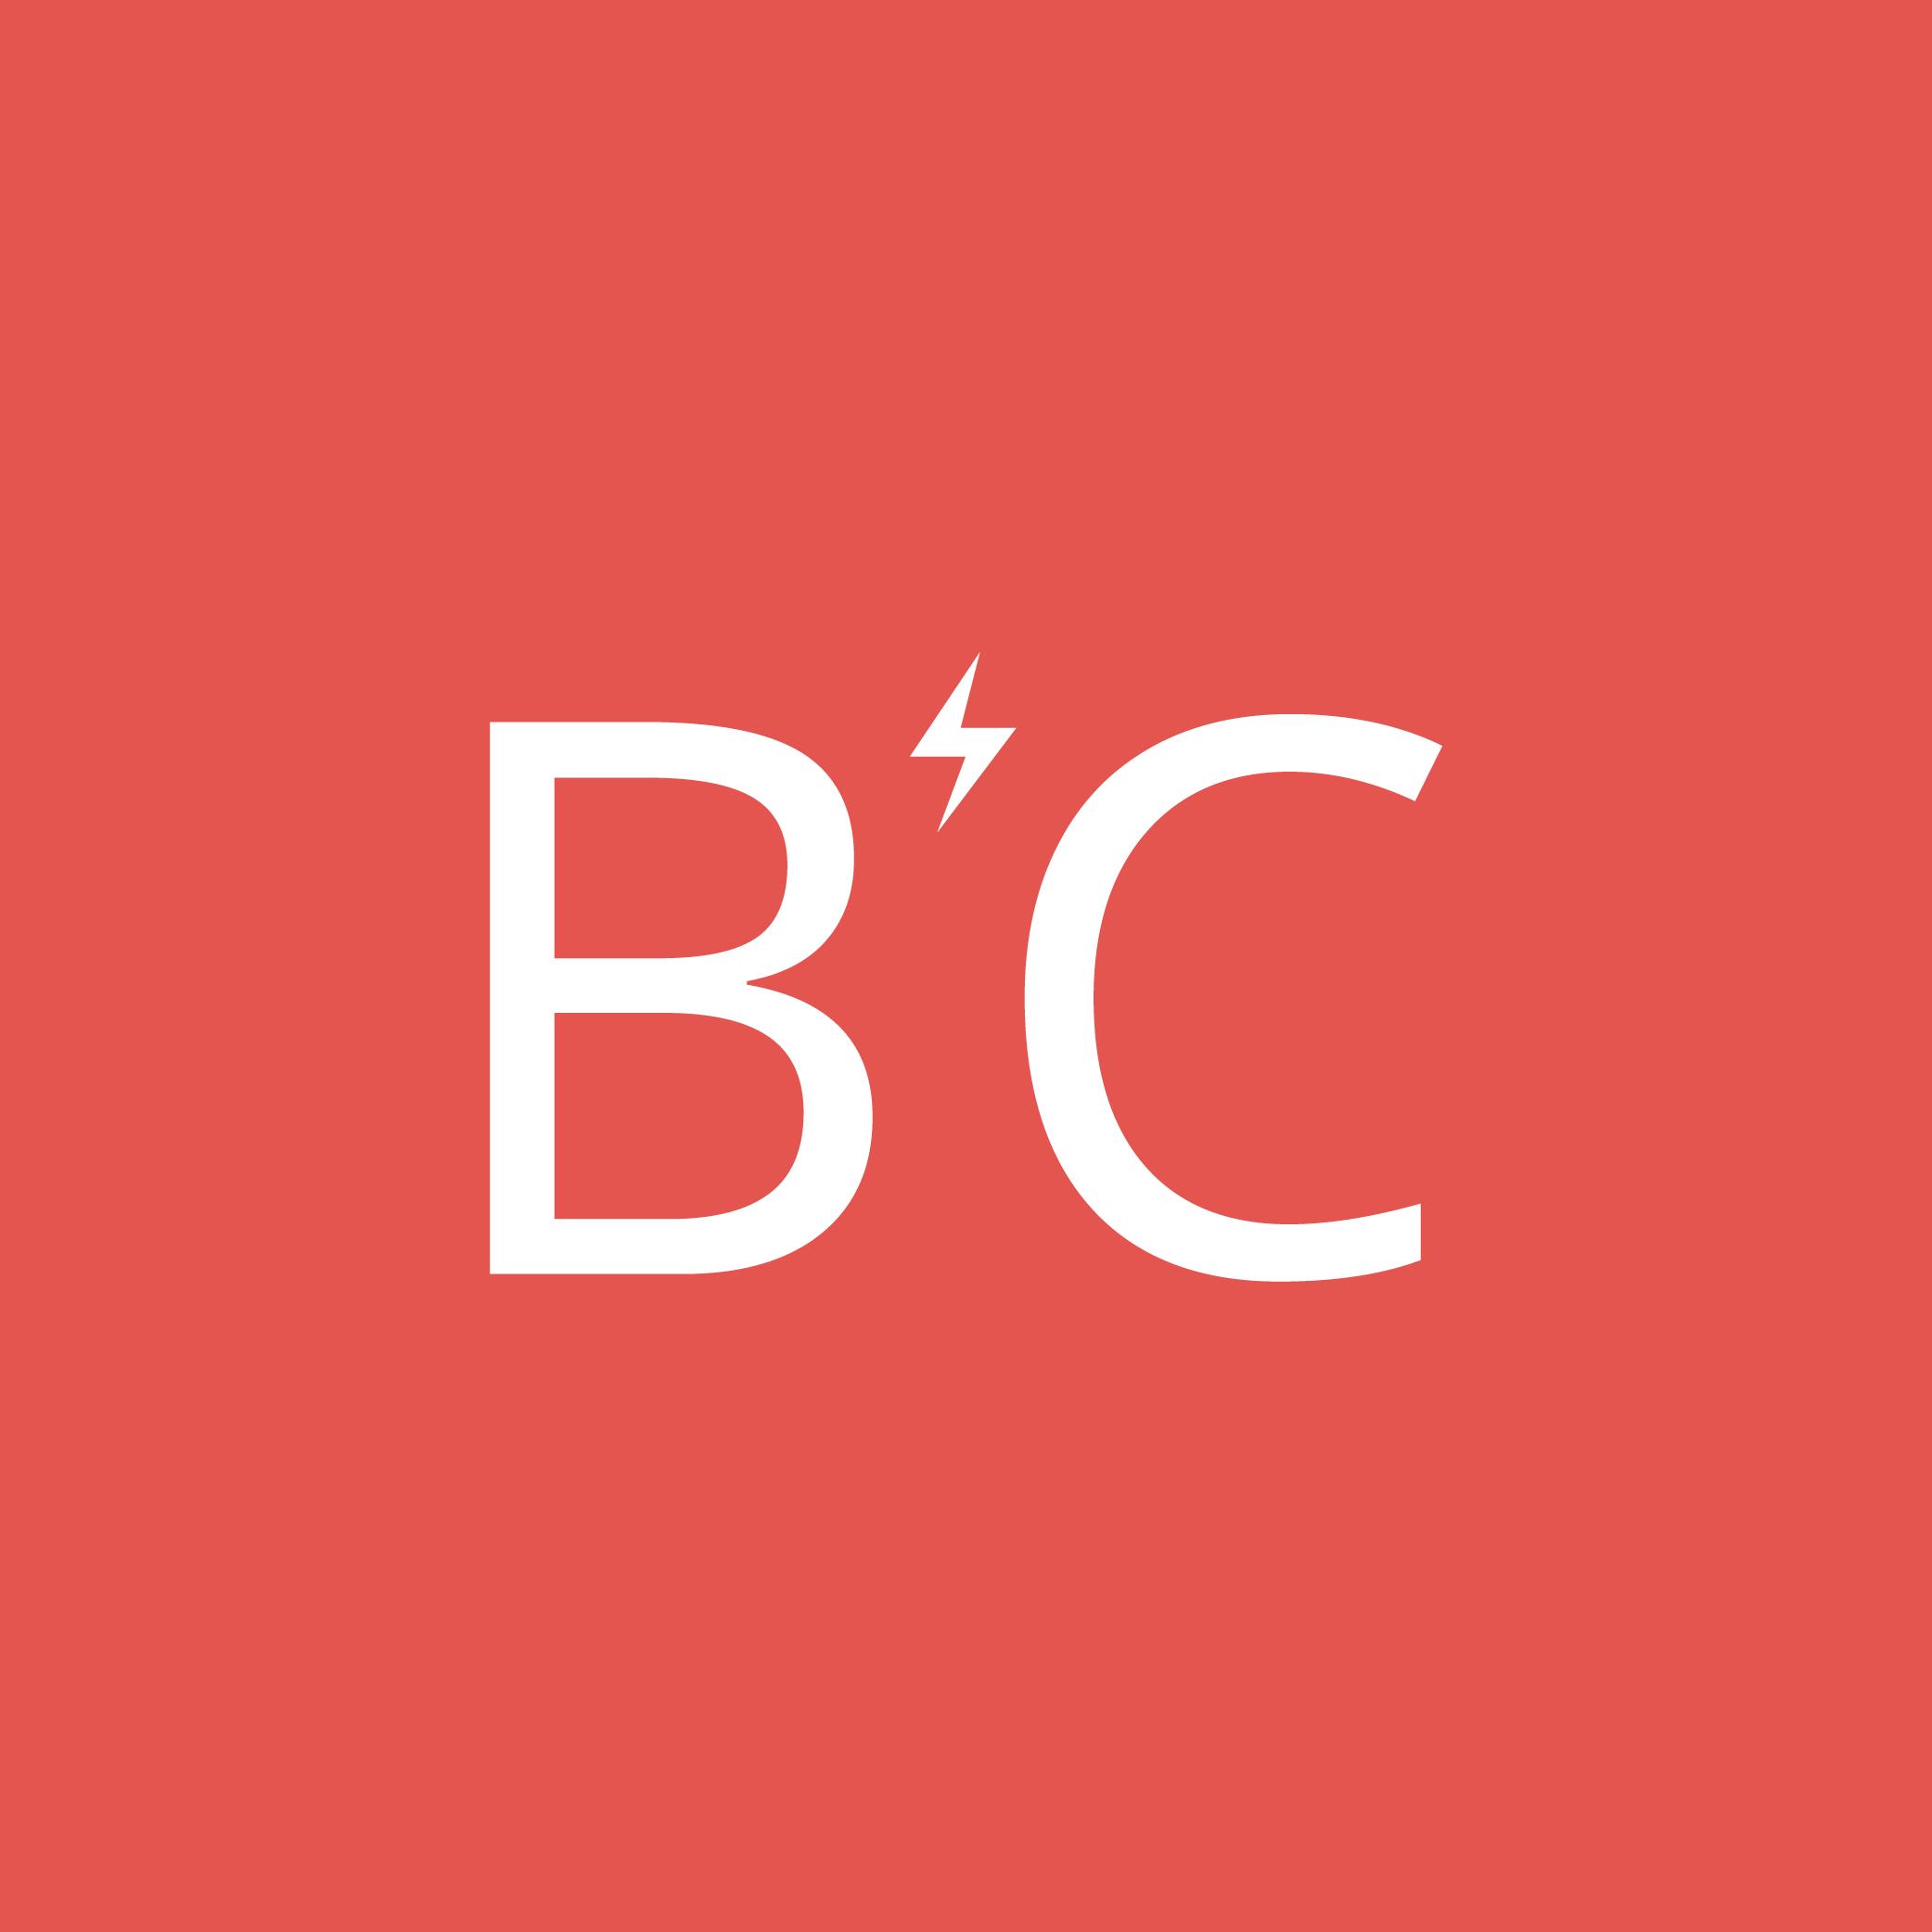 https://3xedigital.com/wp-content/uploads/2019/05/brightspark_logo-01.png